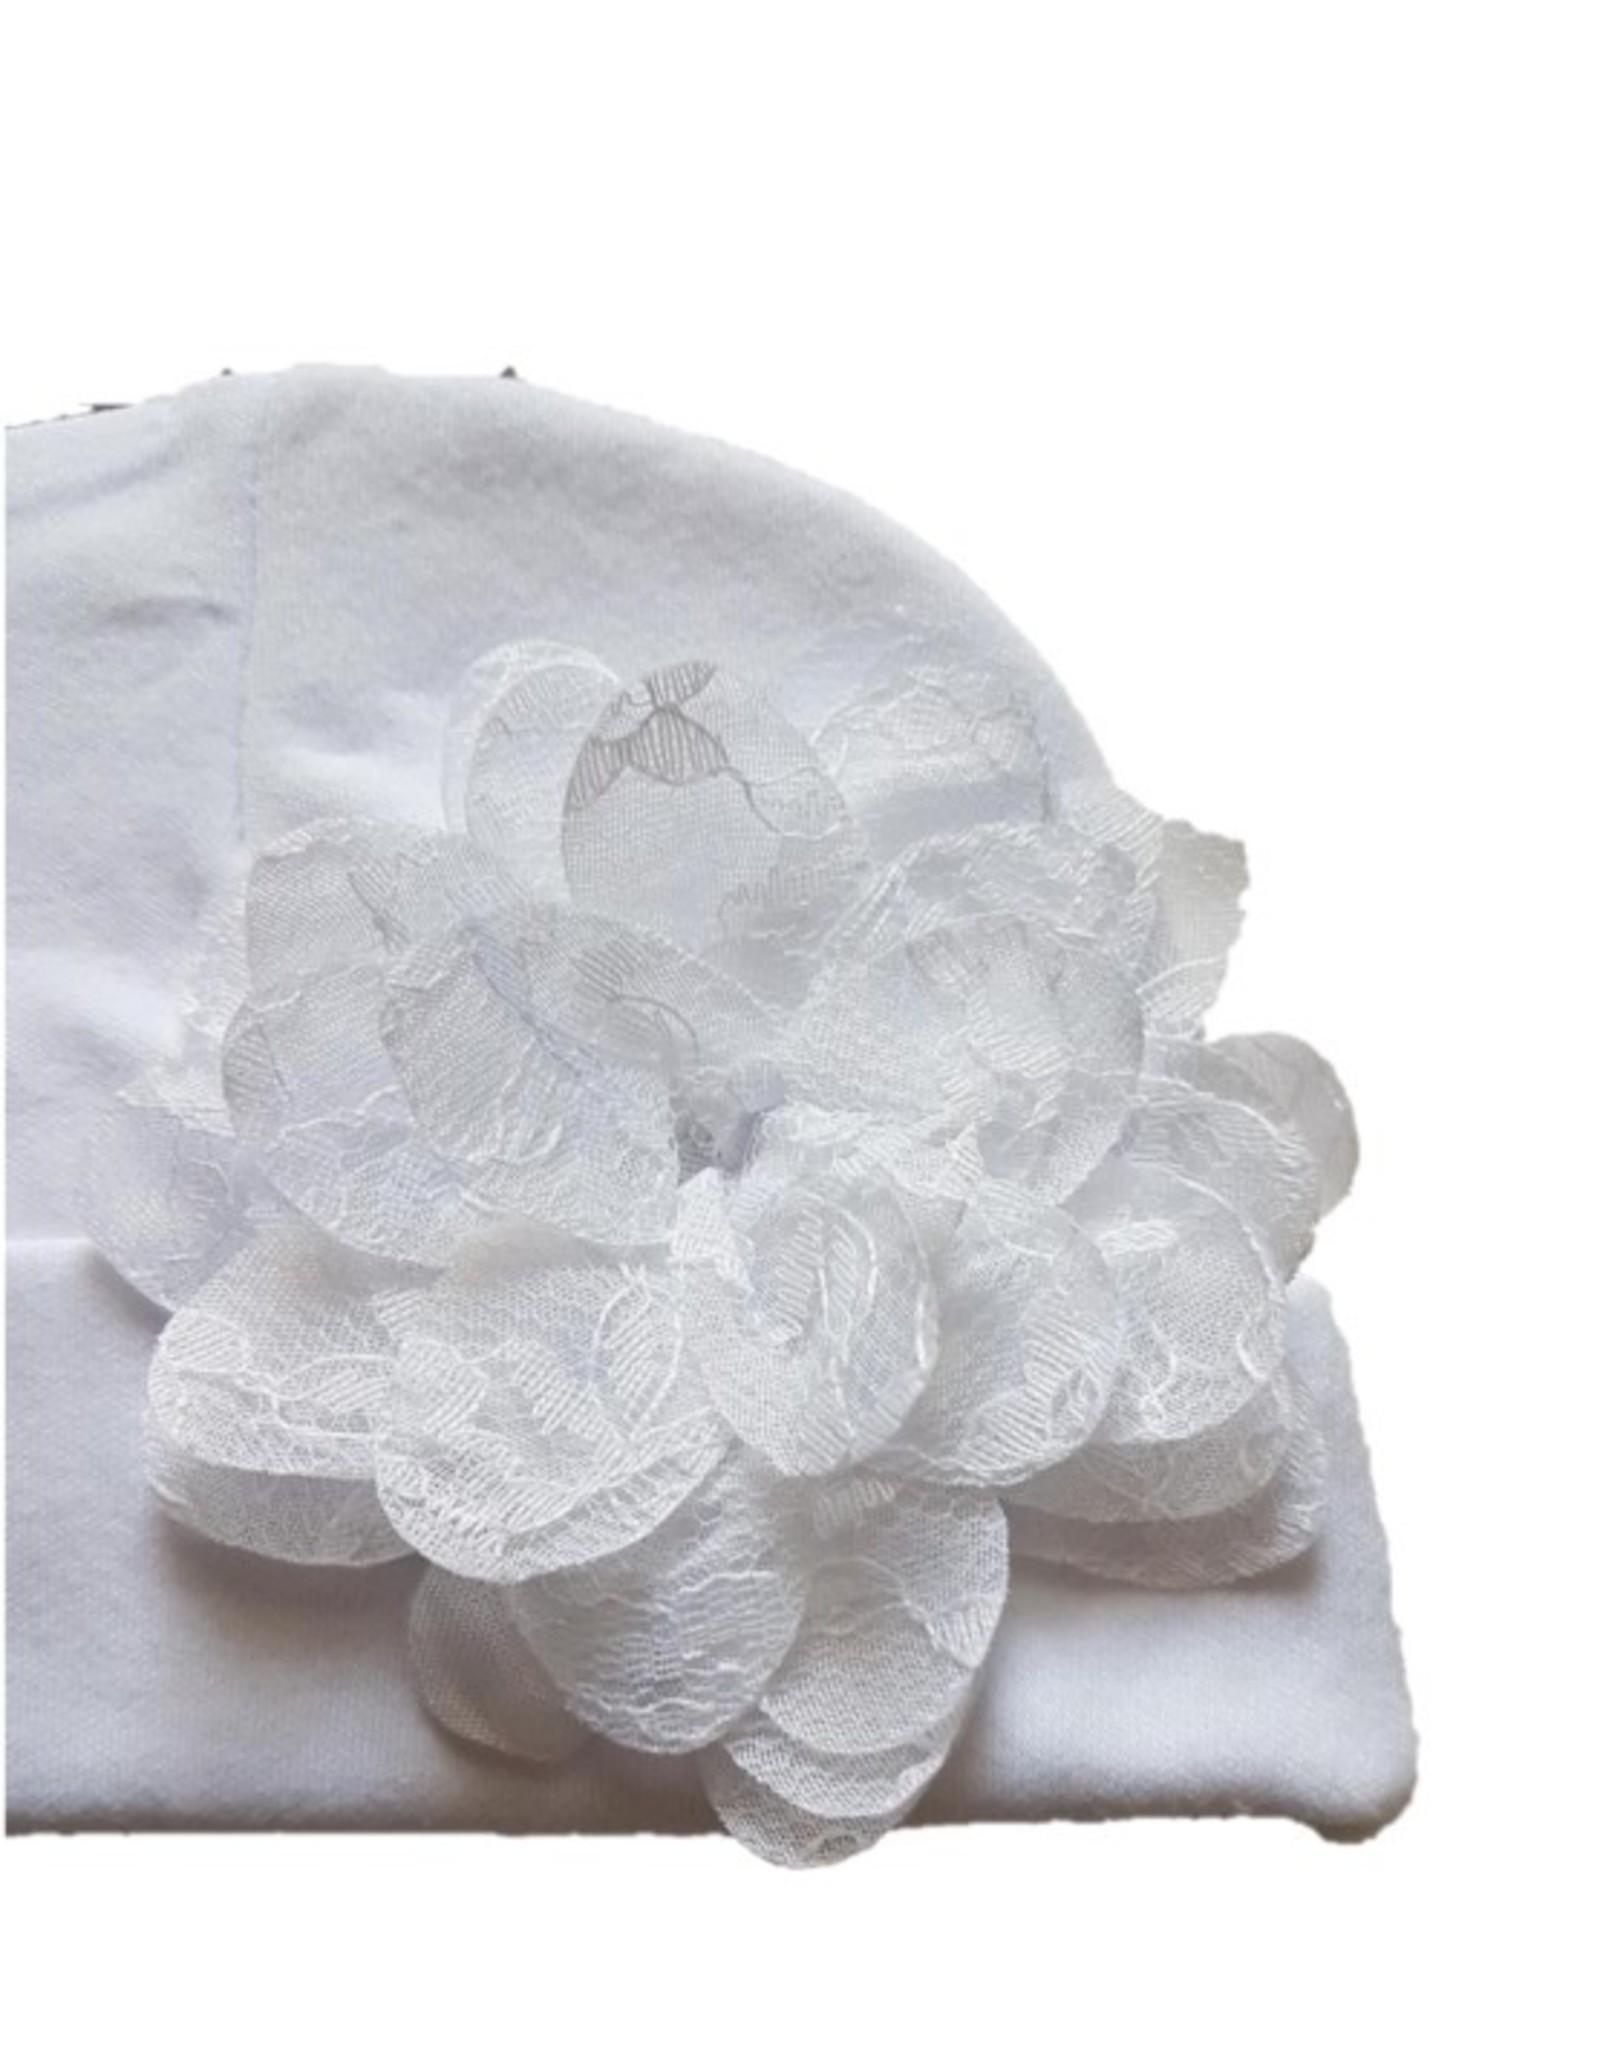 Muts Flora blanco - met kanten bloem